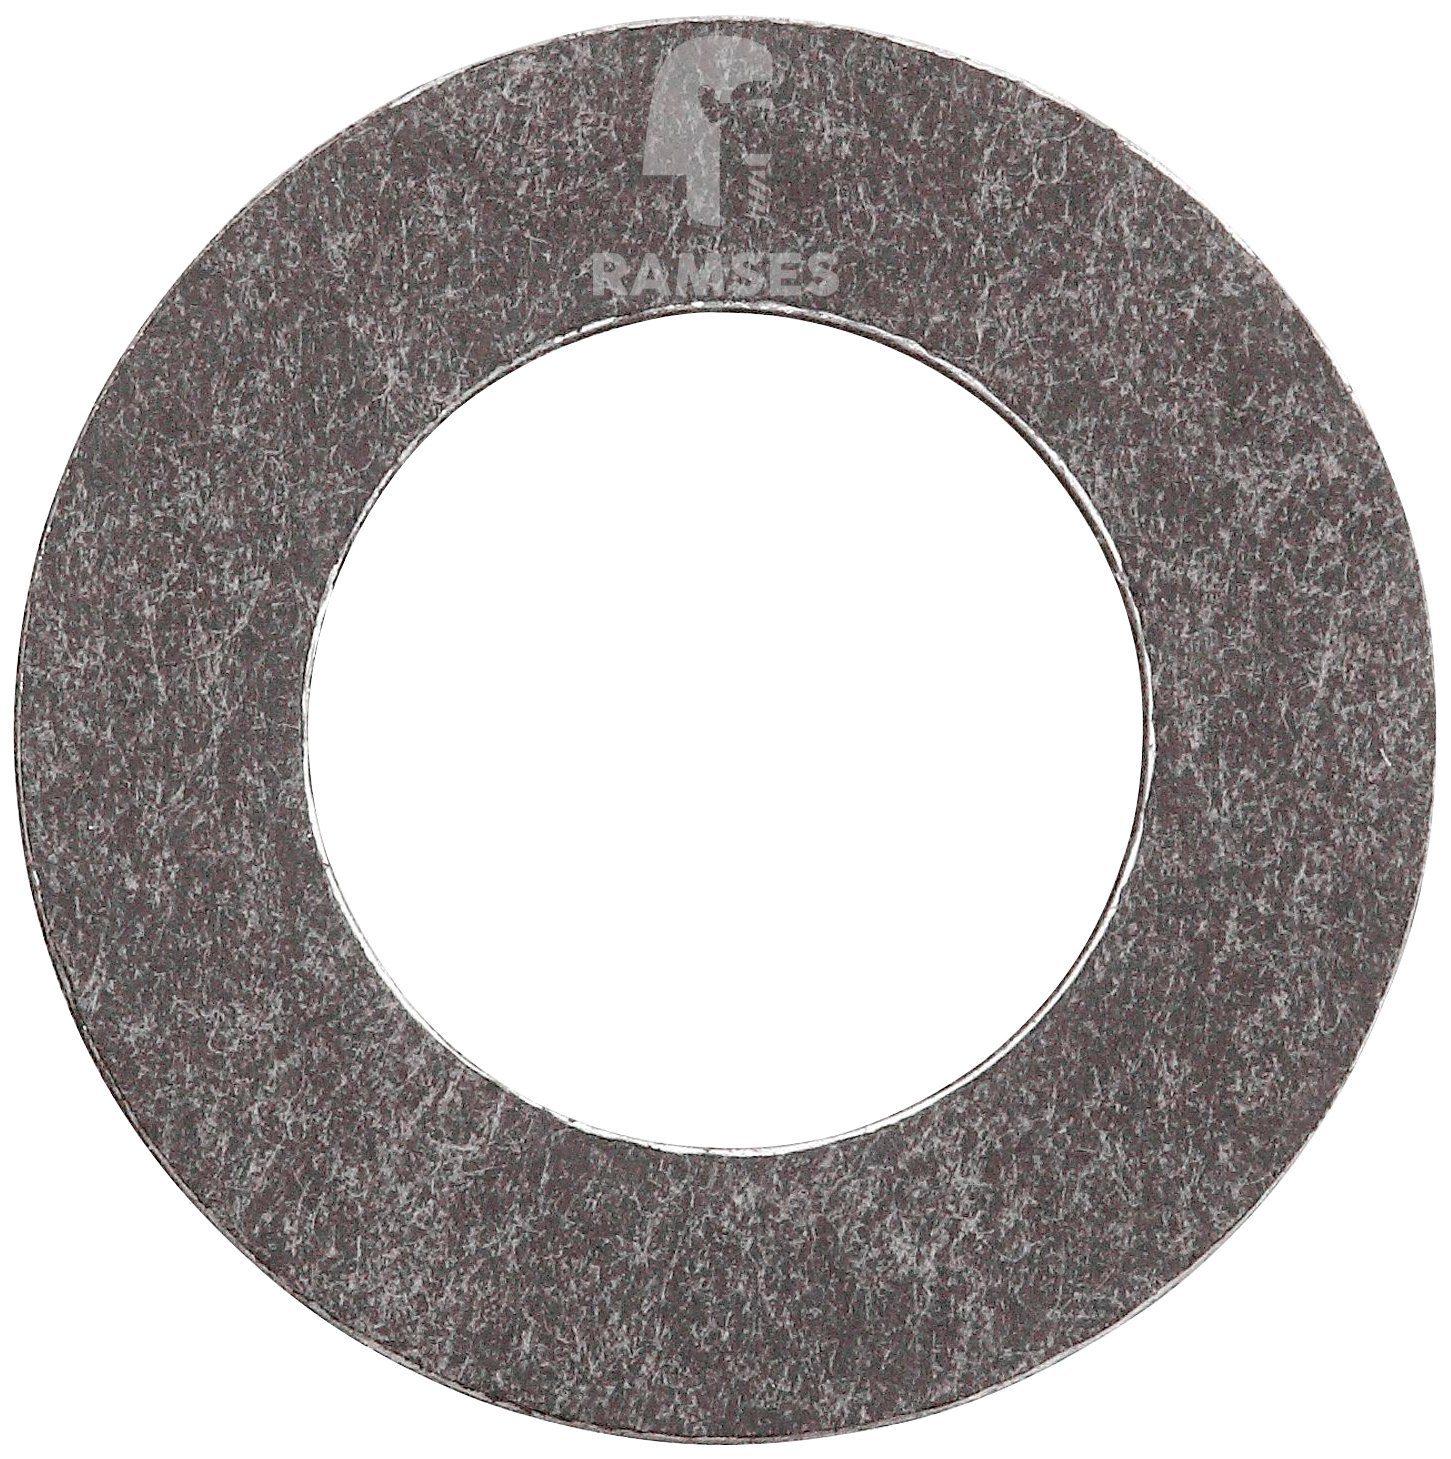 RAMSES Dichtring , DIN 7603 Form A 12 x 21 x 1,0 mm Alu verzinkt 100 Stück